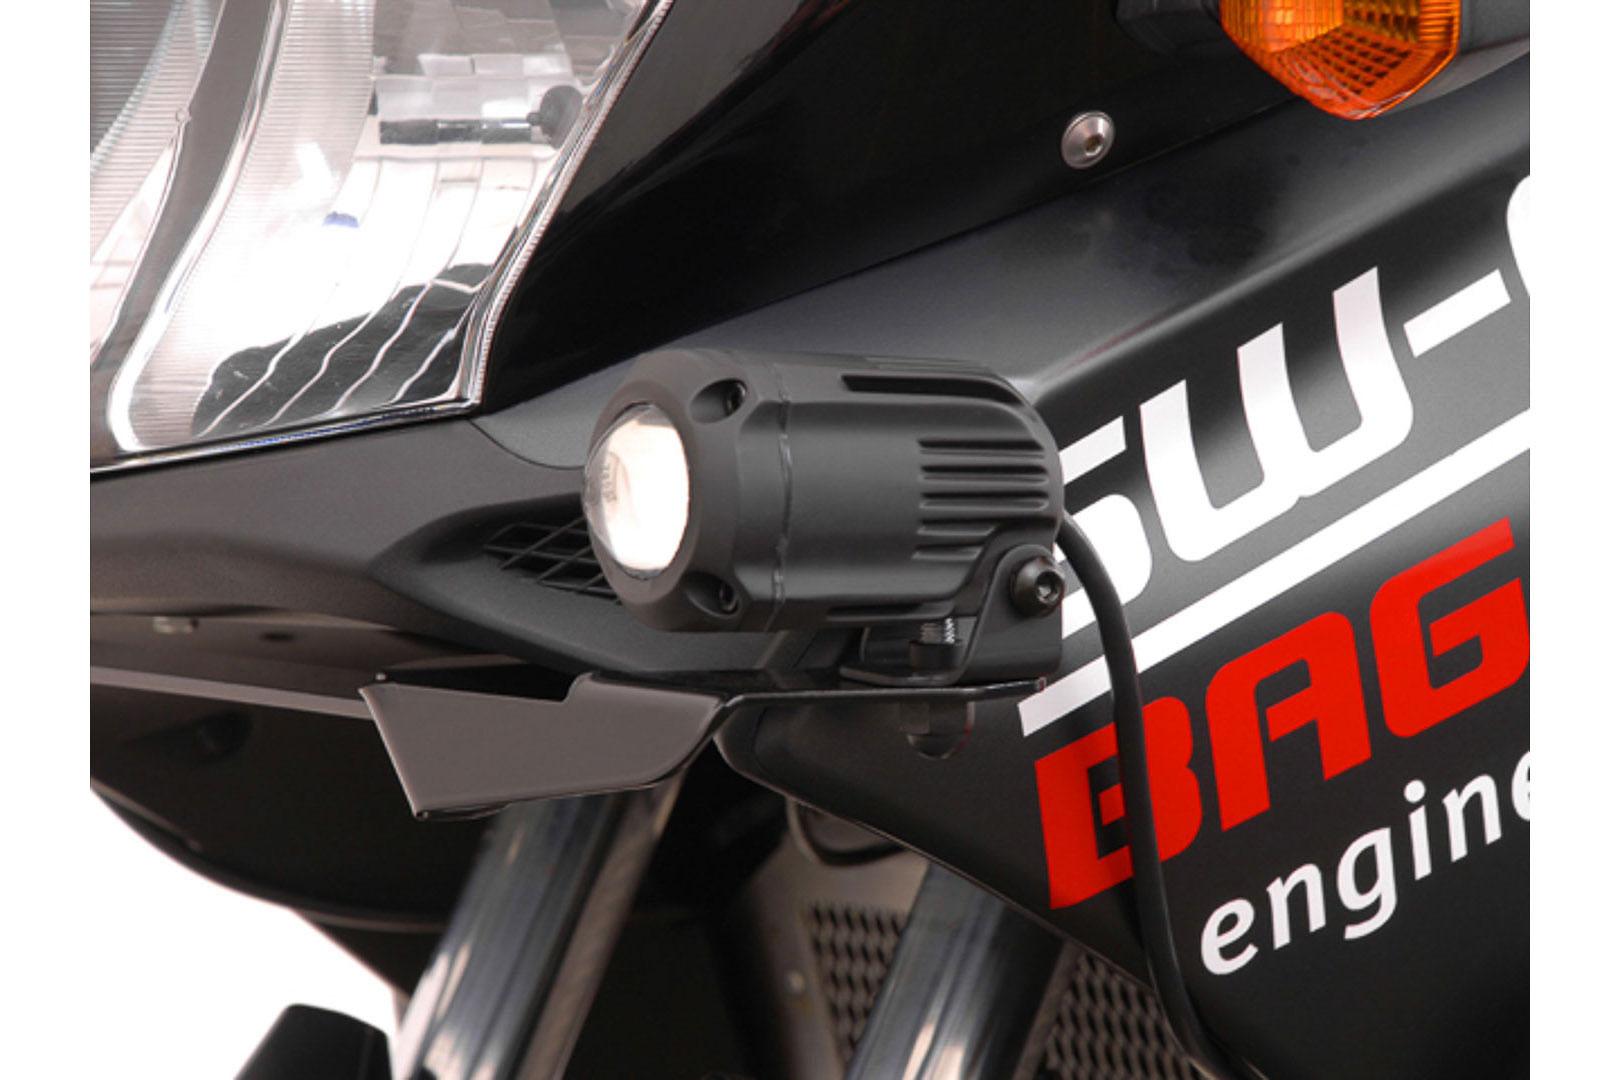 SW-Motech HAWK-lisävalosarjan kiinnike, Suzuki DL650/DL1000 V-Strom/KLV1000